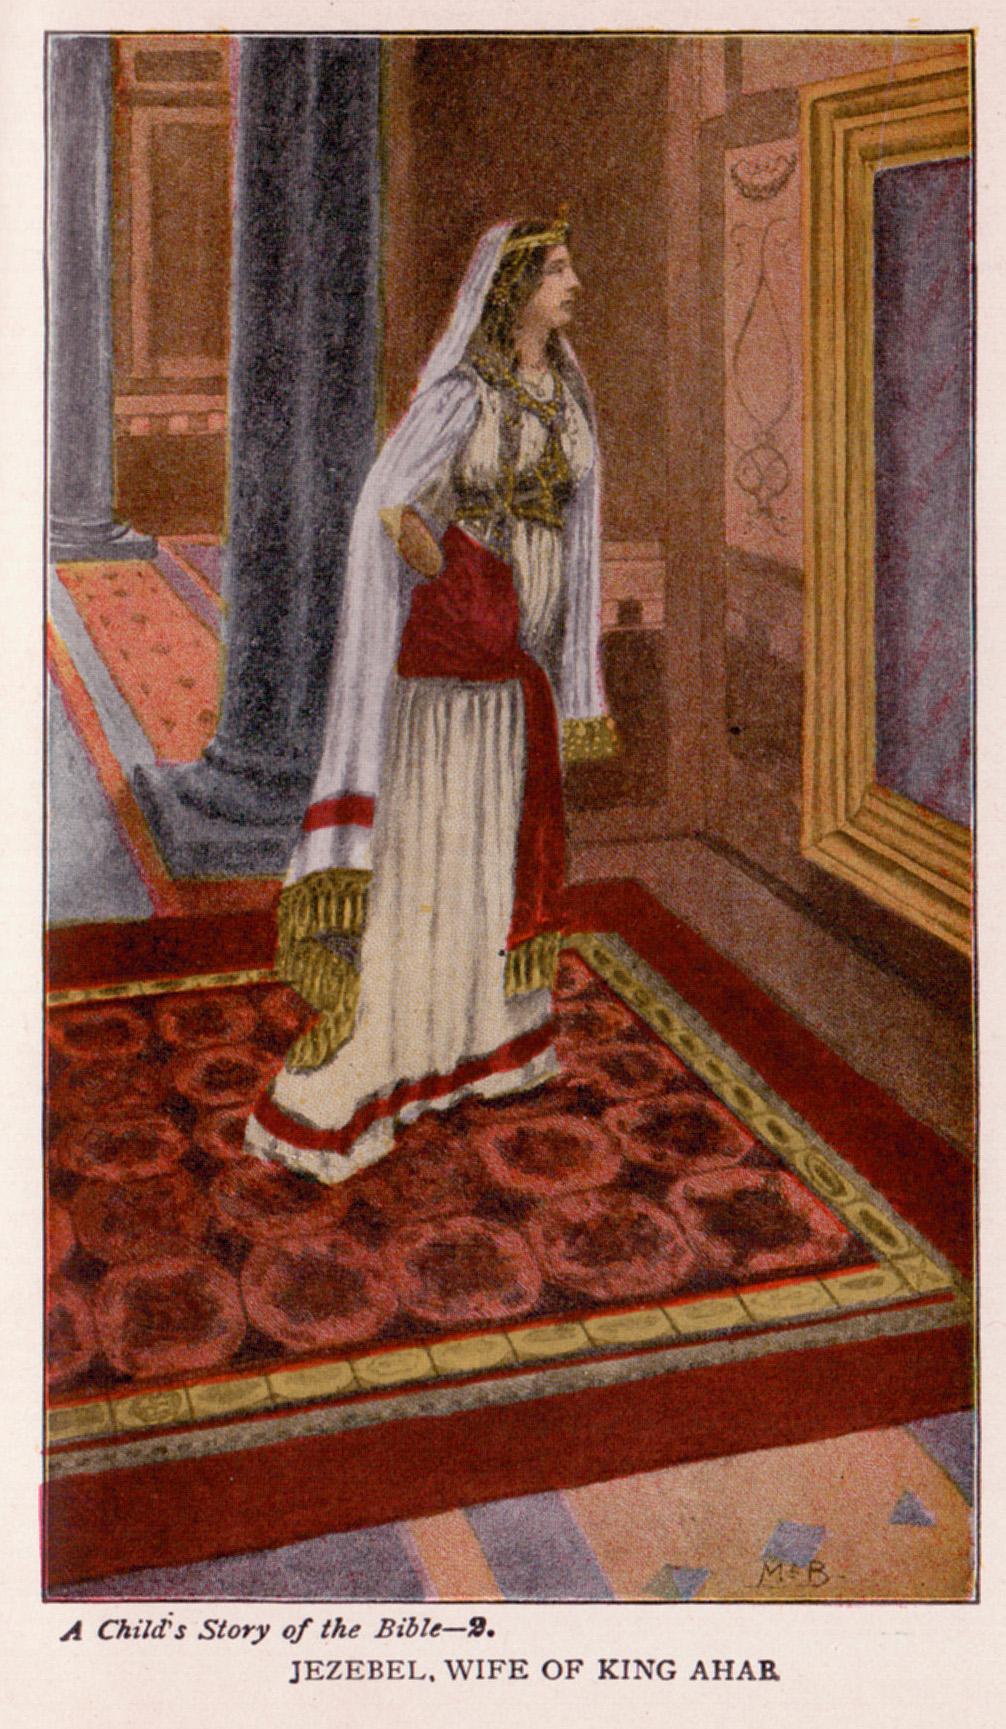 https://upload.wikimedia.org/wikipedia/commons/6/6e/Jezebel_2.jpg